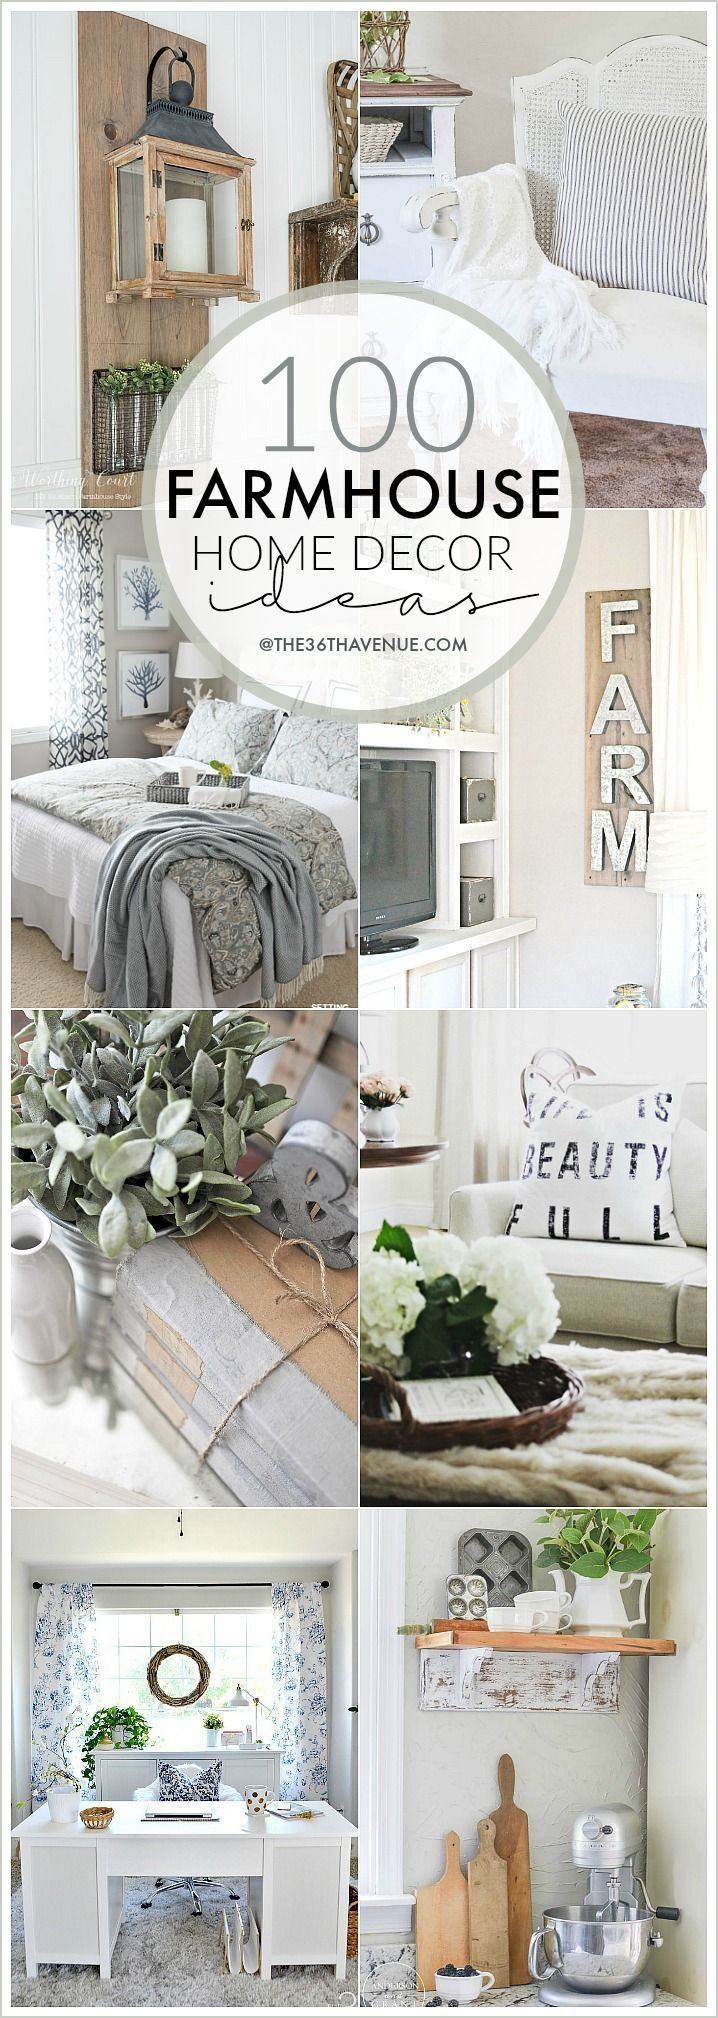 Home Decorating Ideas Bathroom Best 25 Modern Decor: Best 25+ Home Decor Accessories Ideas On Pinterest